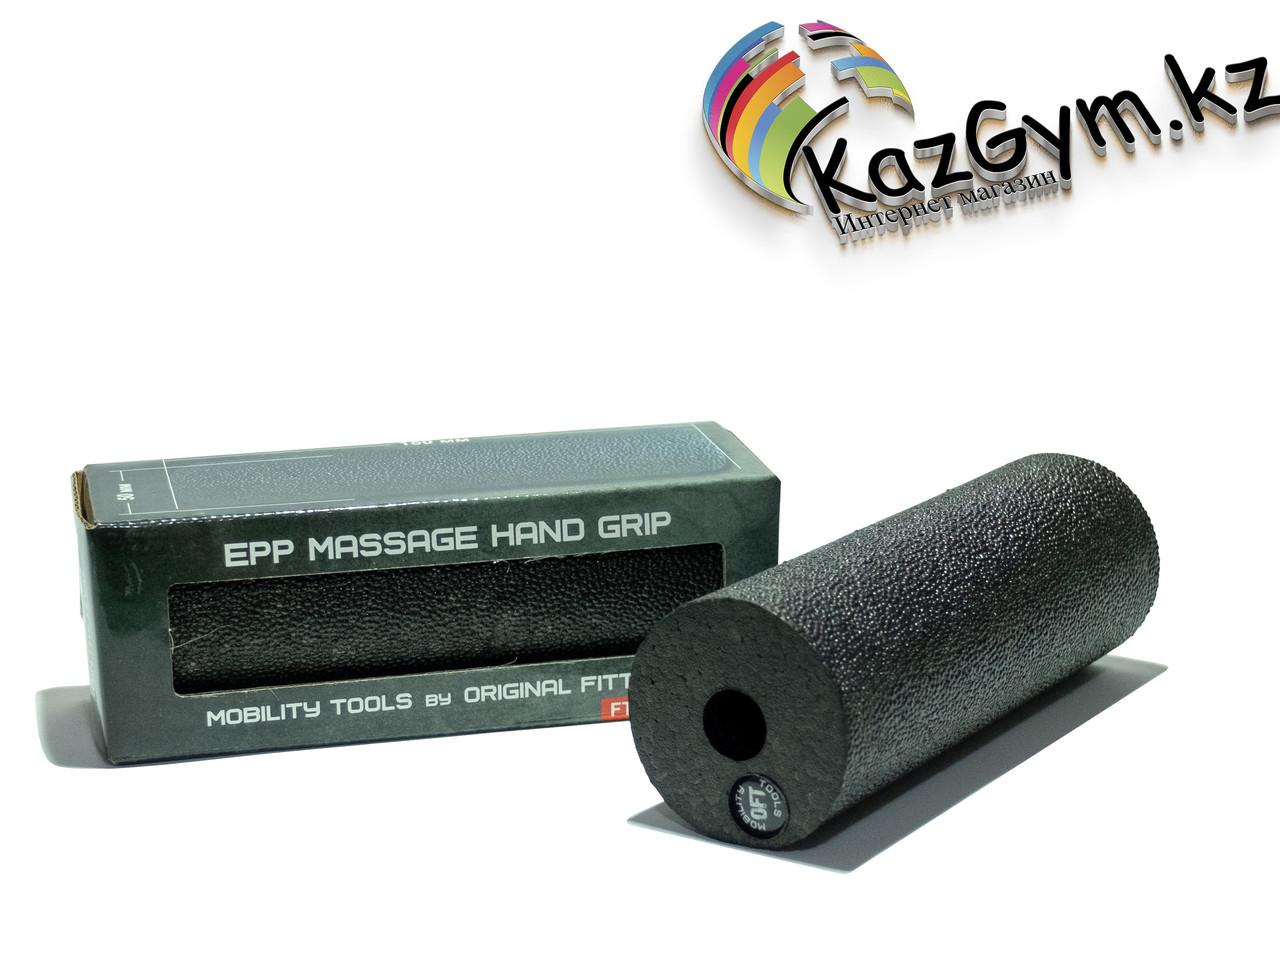 Цилиндр массажный малый EPP 15х5 см (FT-EPP-155)